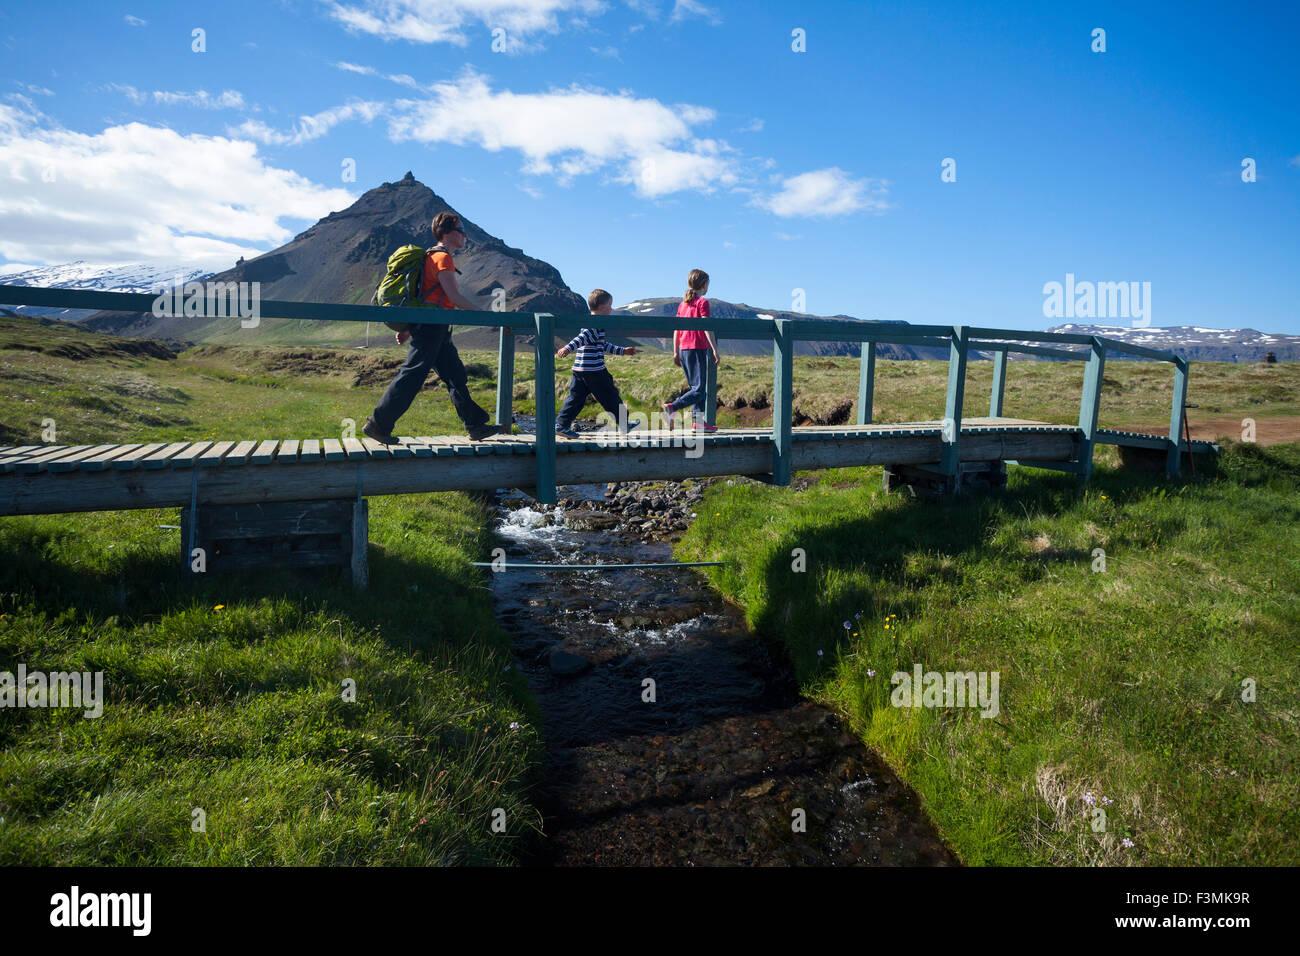 Famiglia escursioni la Hellnar-Arnarstapi sentiero costiero, Snaefellsnes Peninsula, Vesturland, Islanda. Immagini Stock